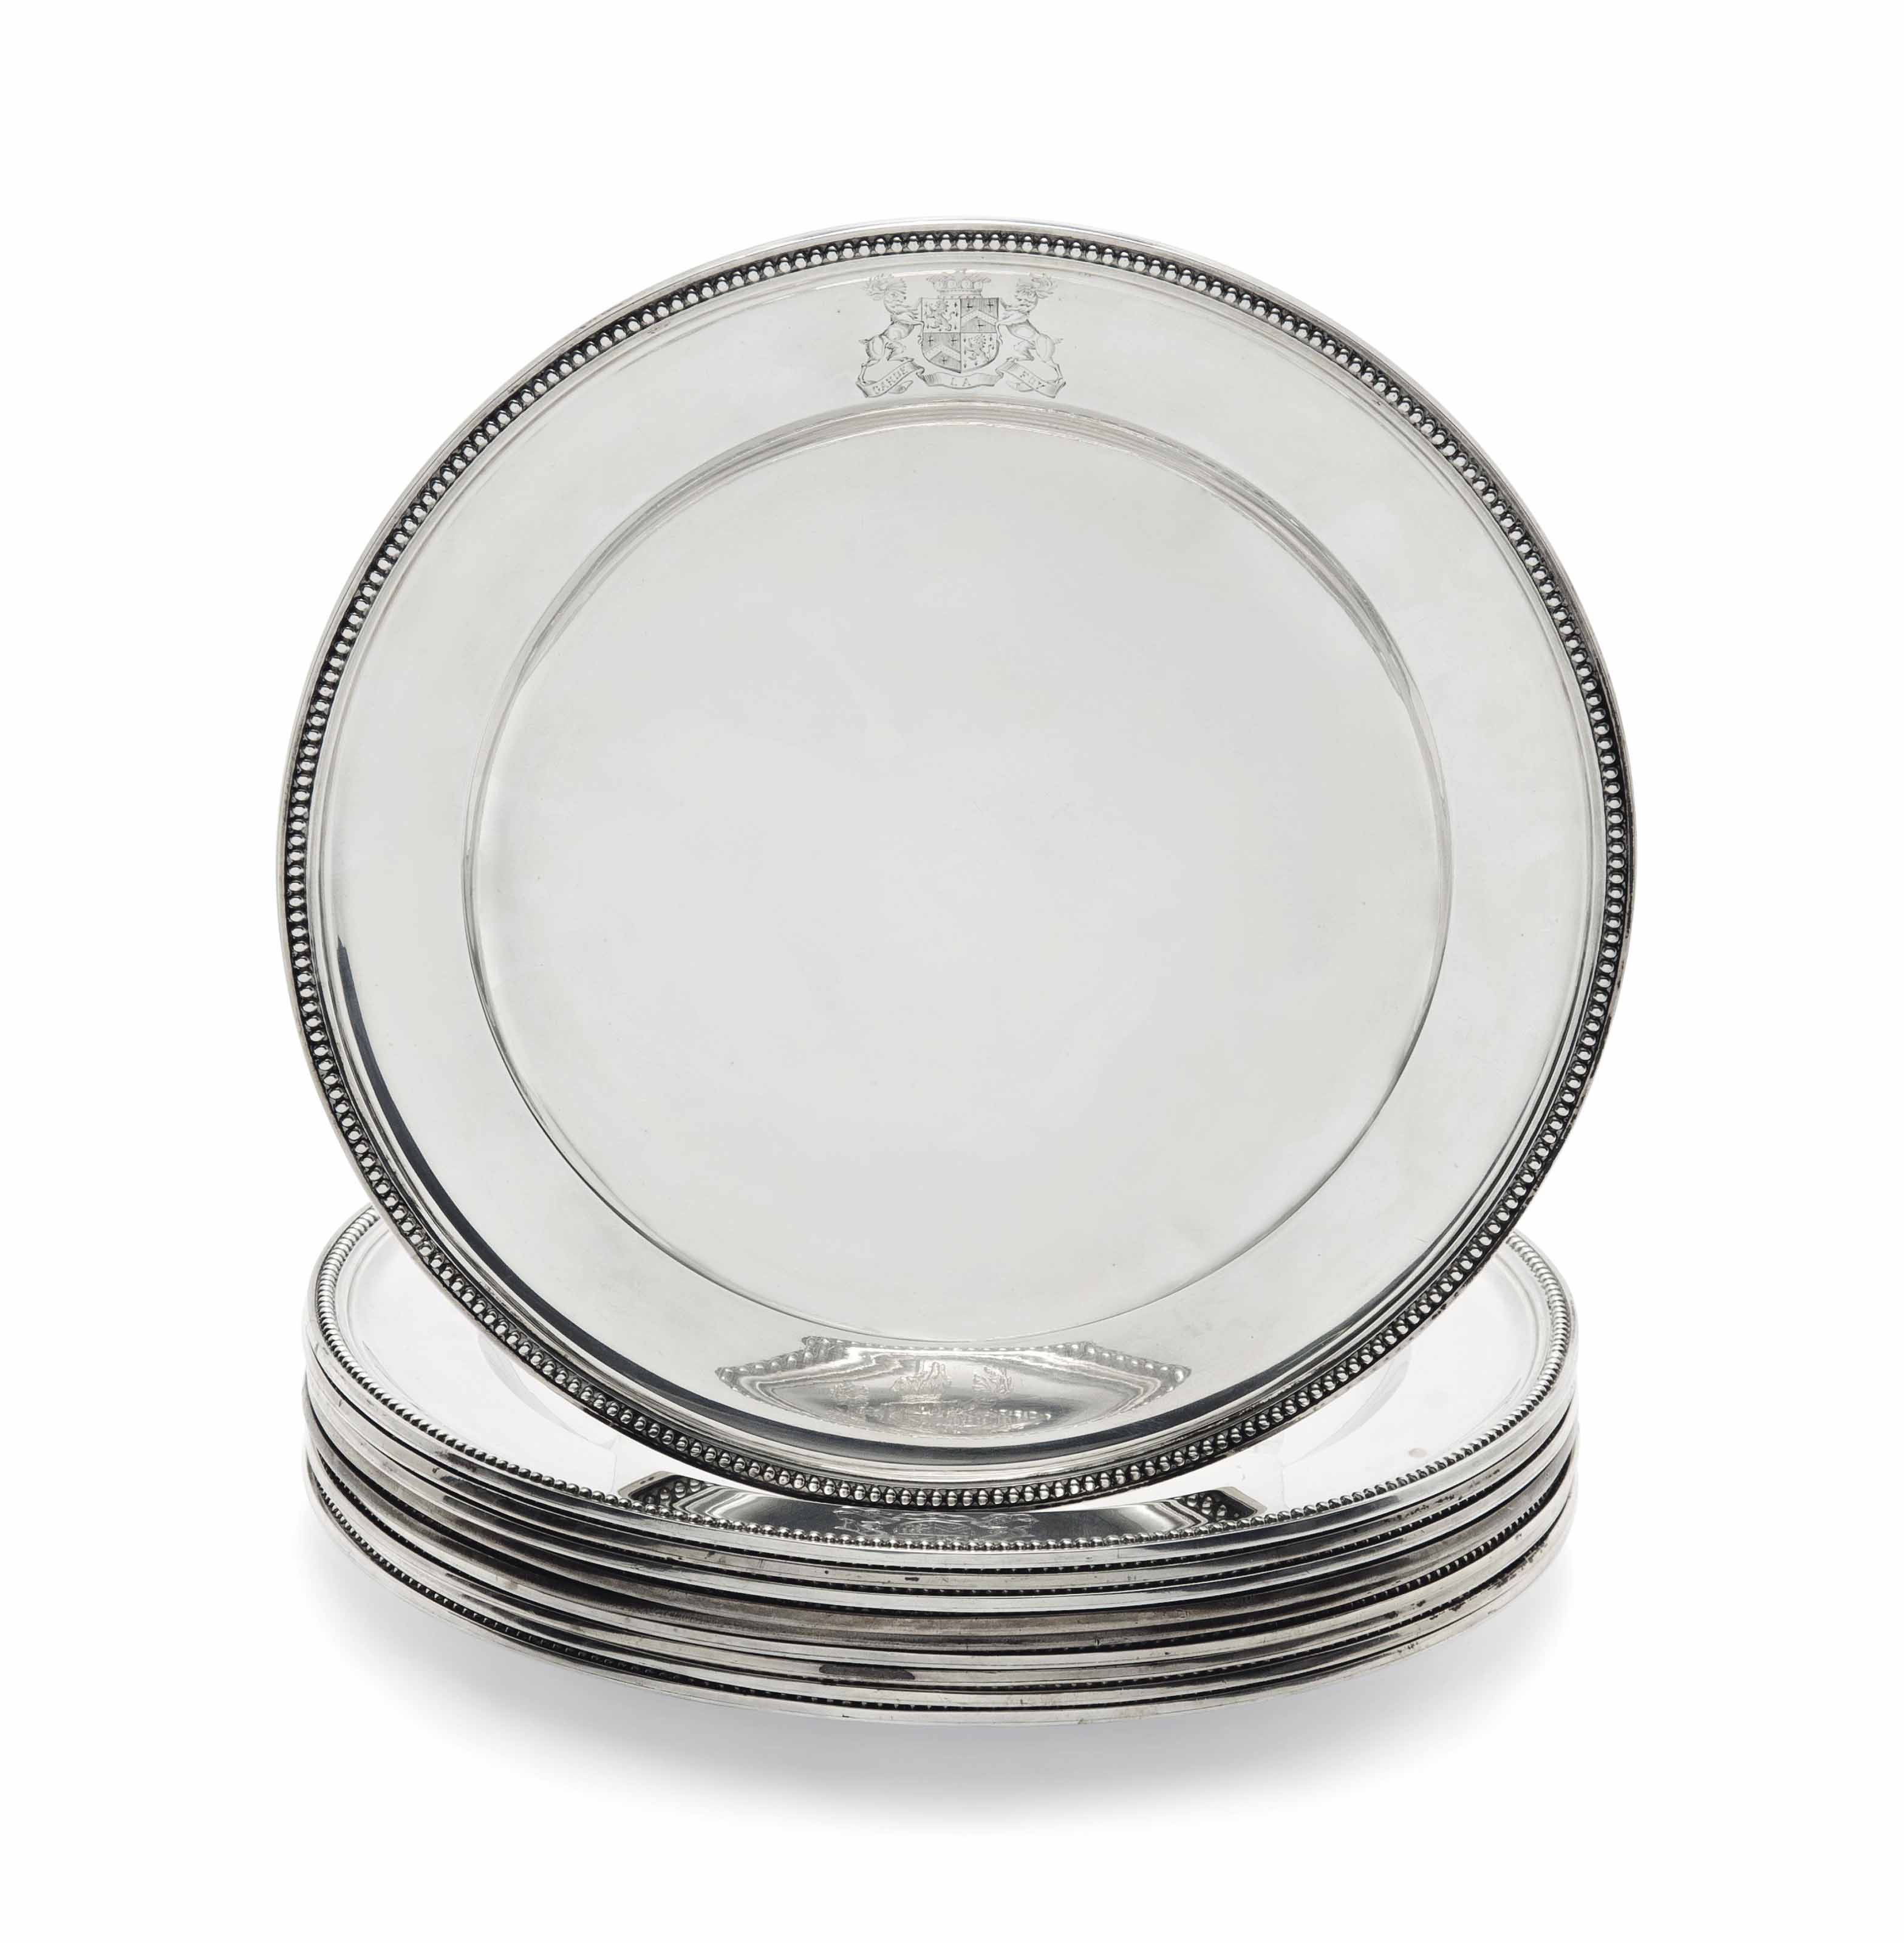 A SET OF TEN VICTORIAN SILVER DINNER PLATES